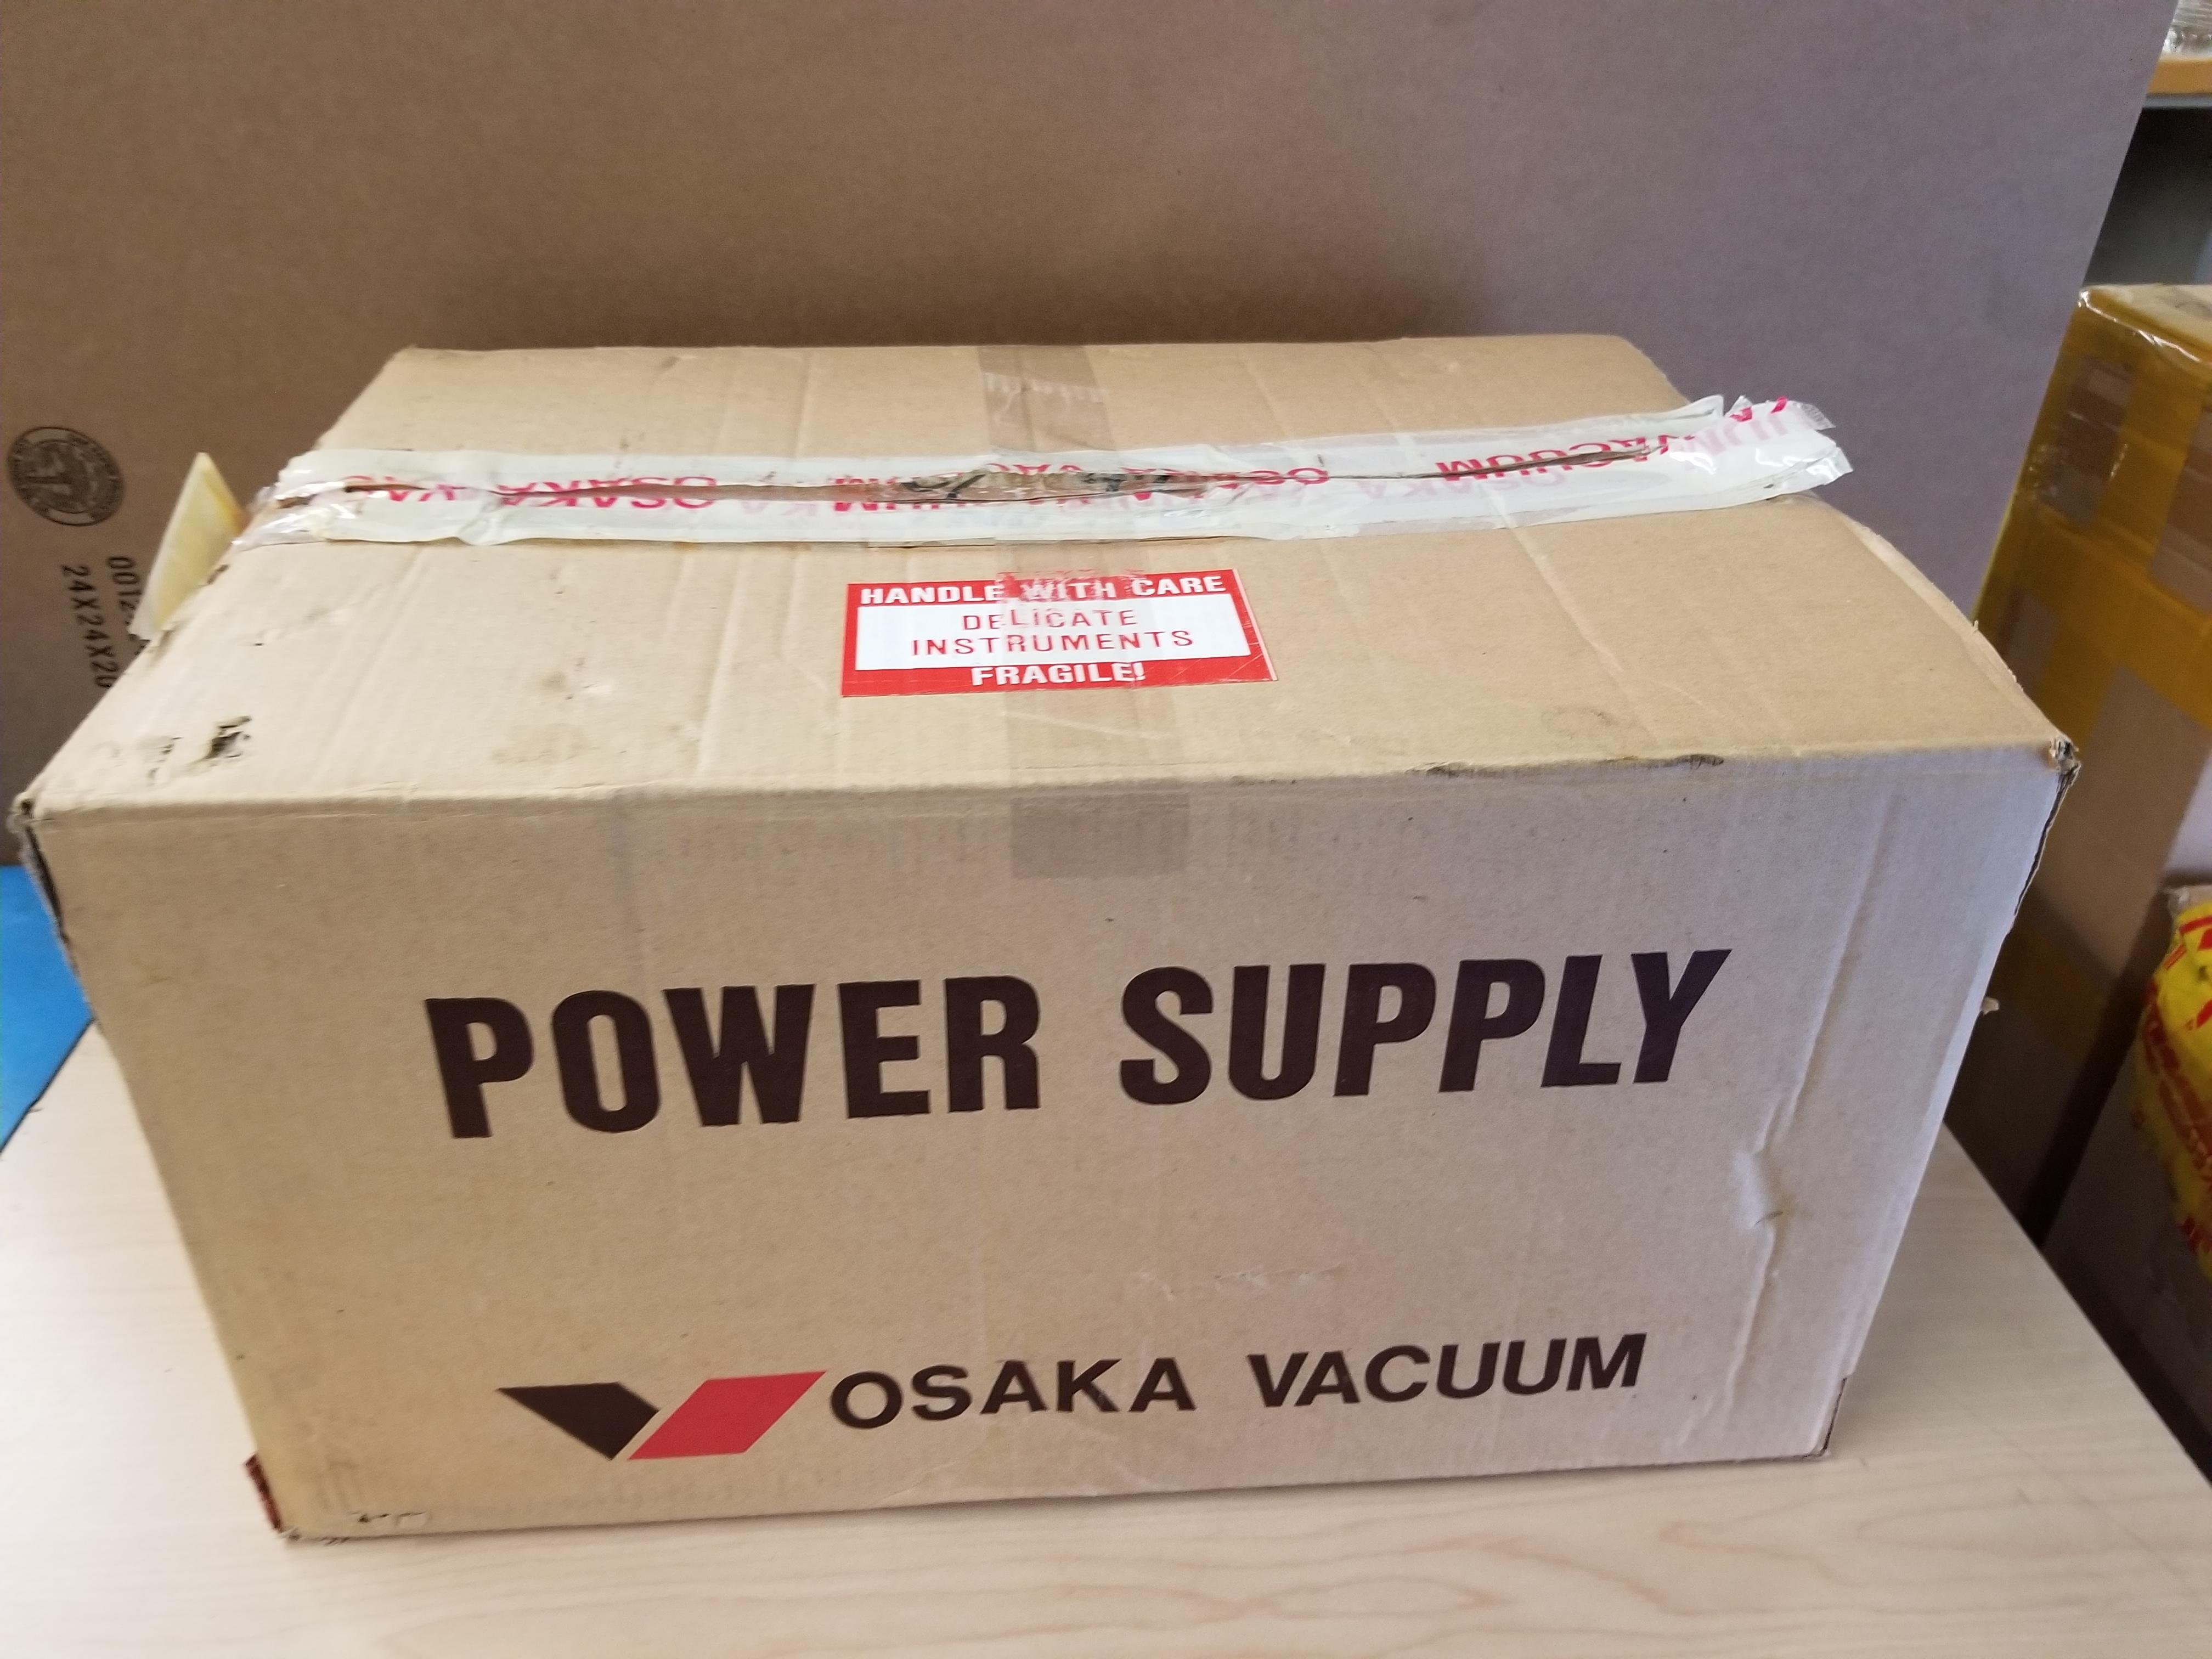 New Osaka TurboMolecular Turbo Vacuum Pump Power Supply TC3200